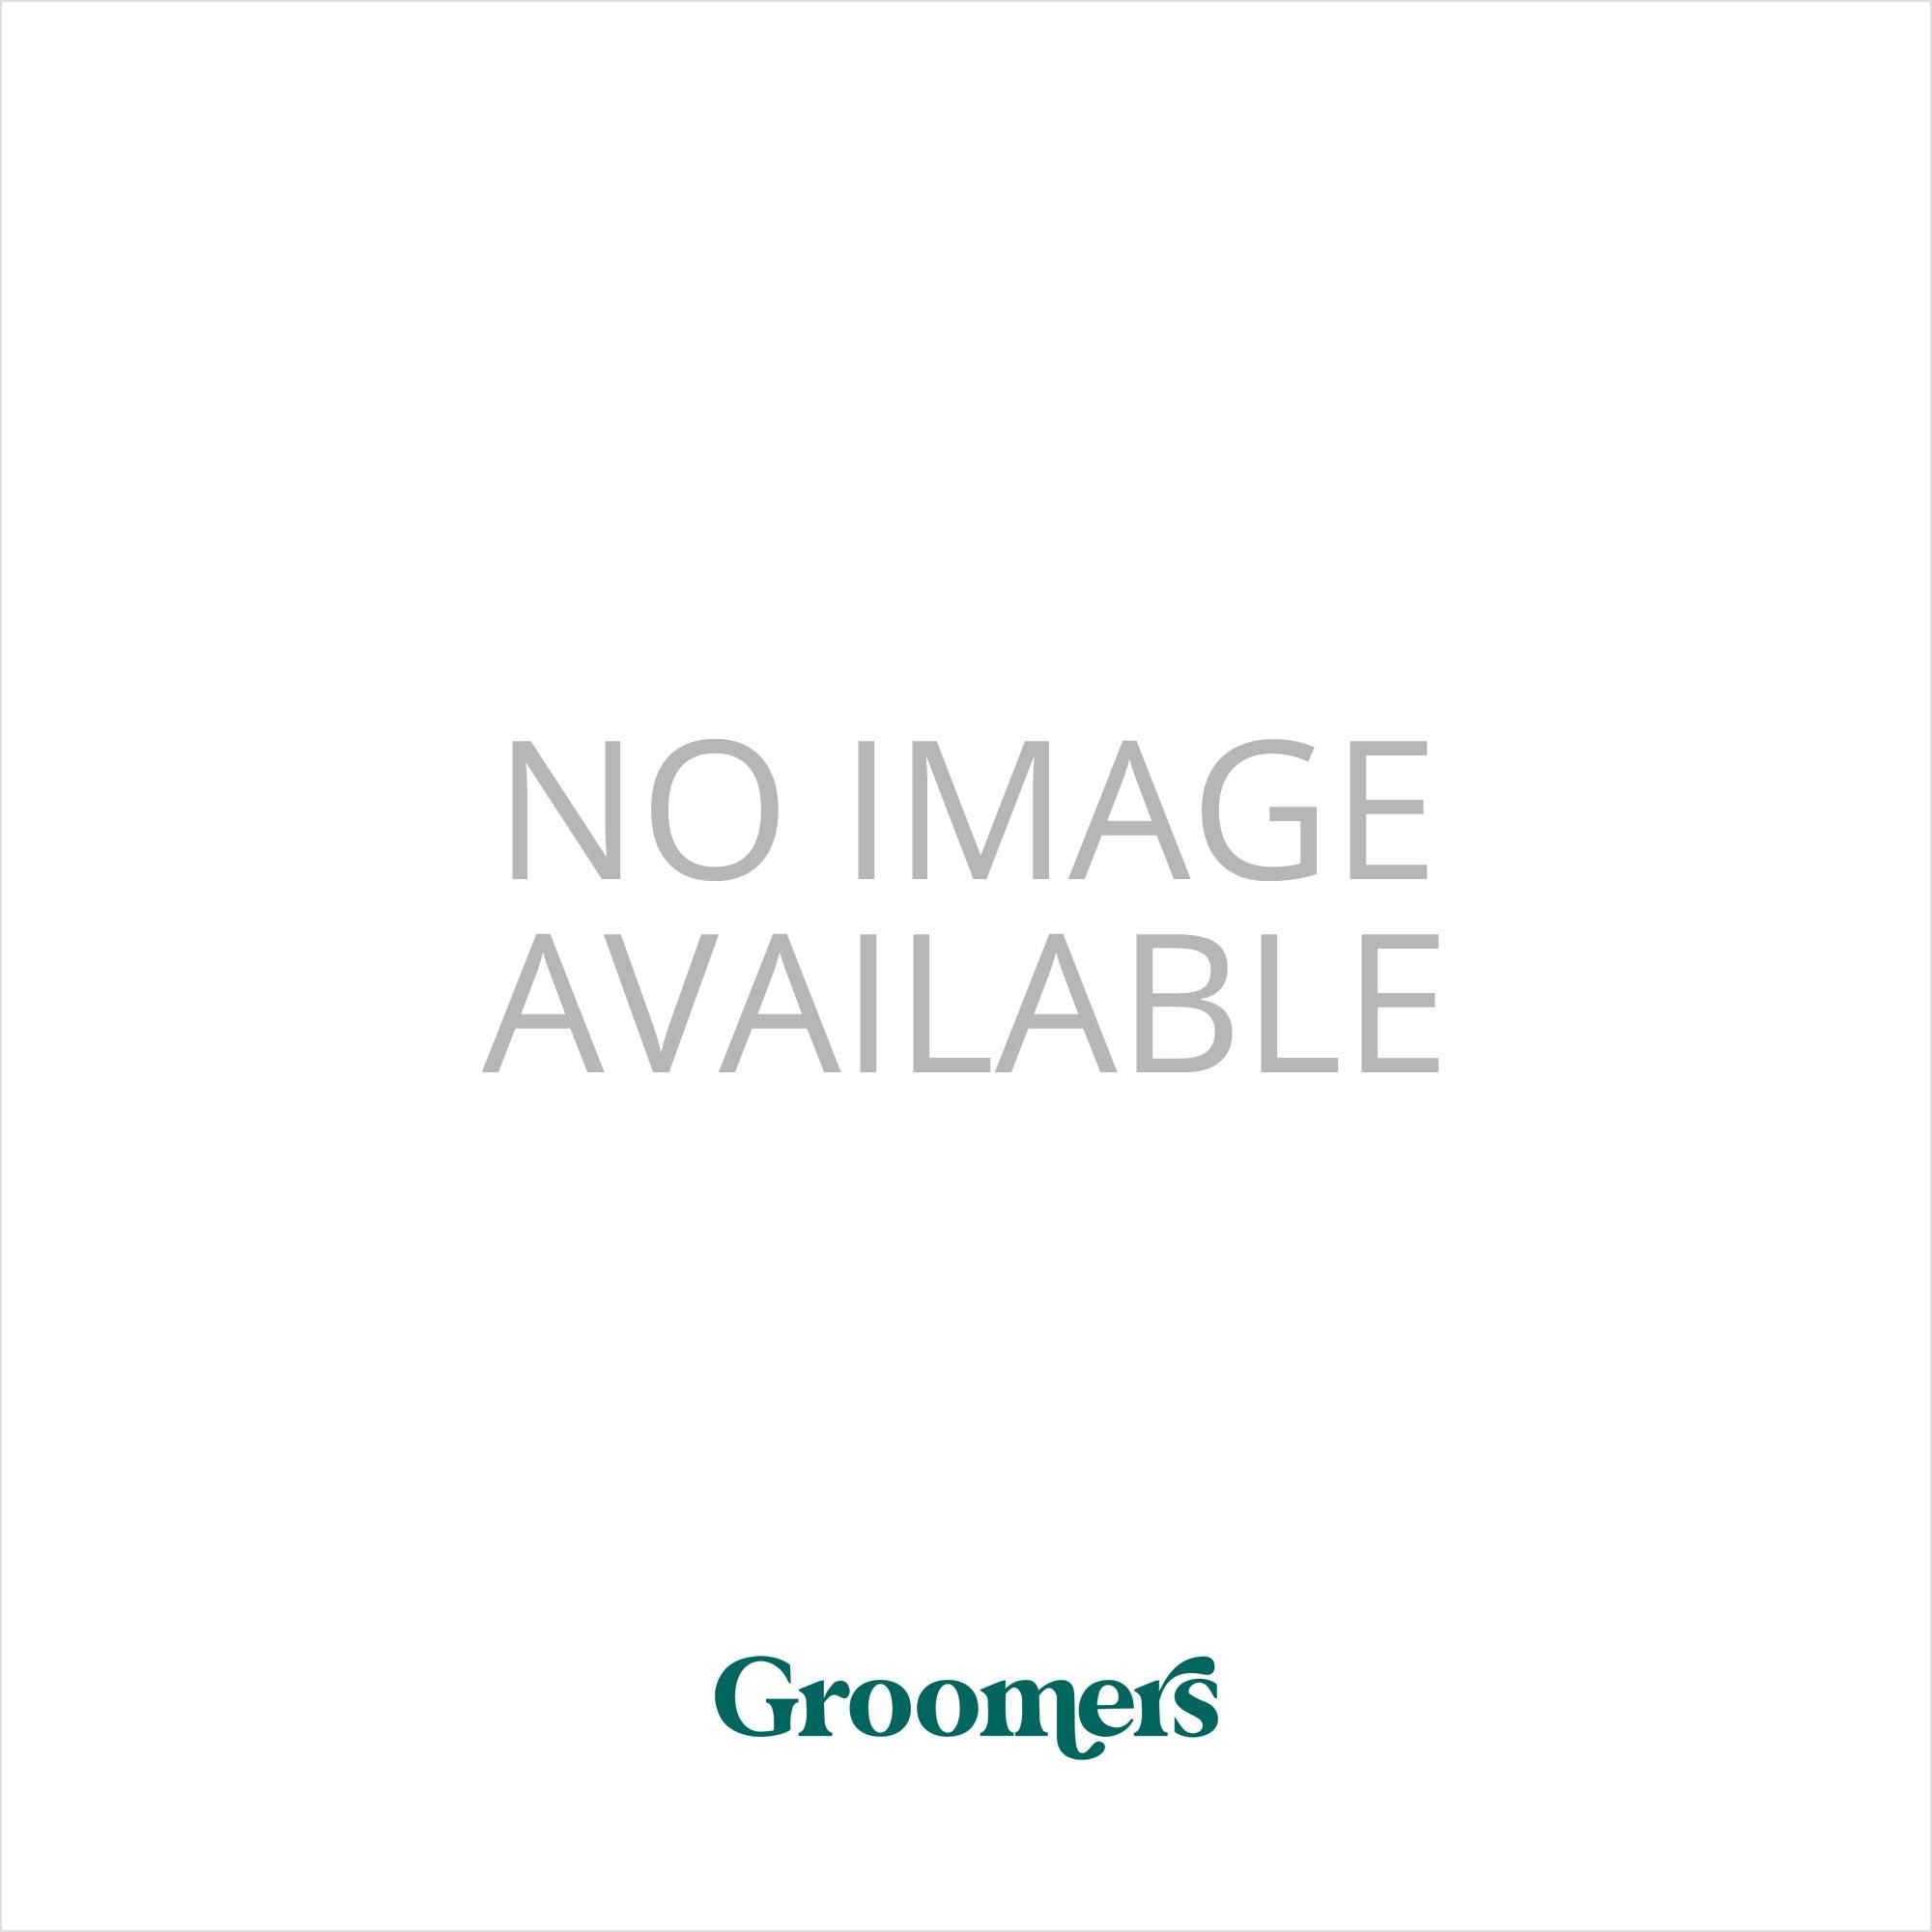 Groomers 3% Evening Primrose Oil Shampoo